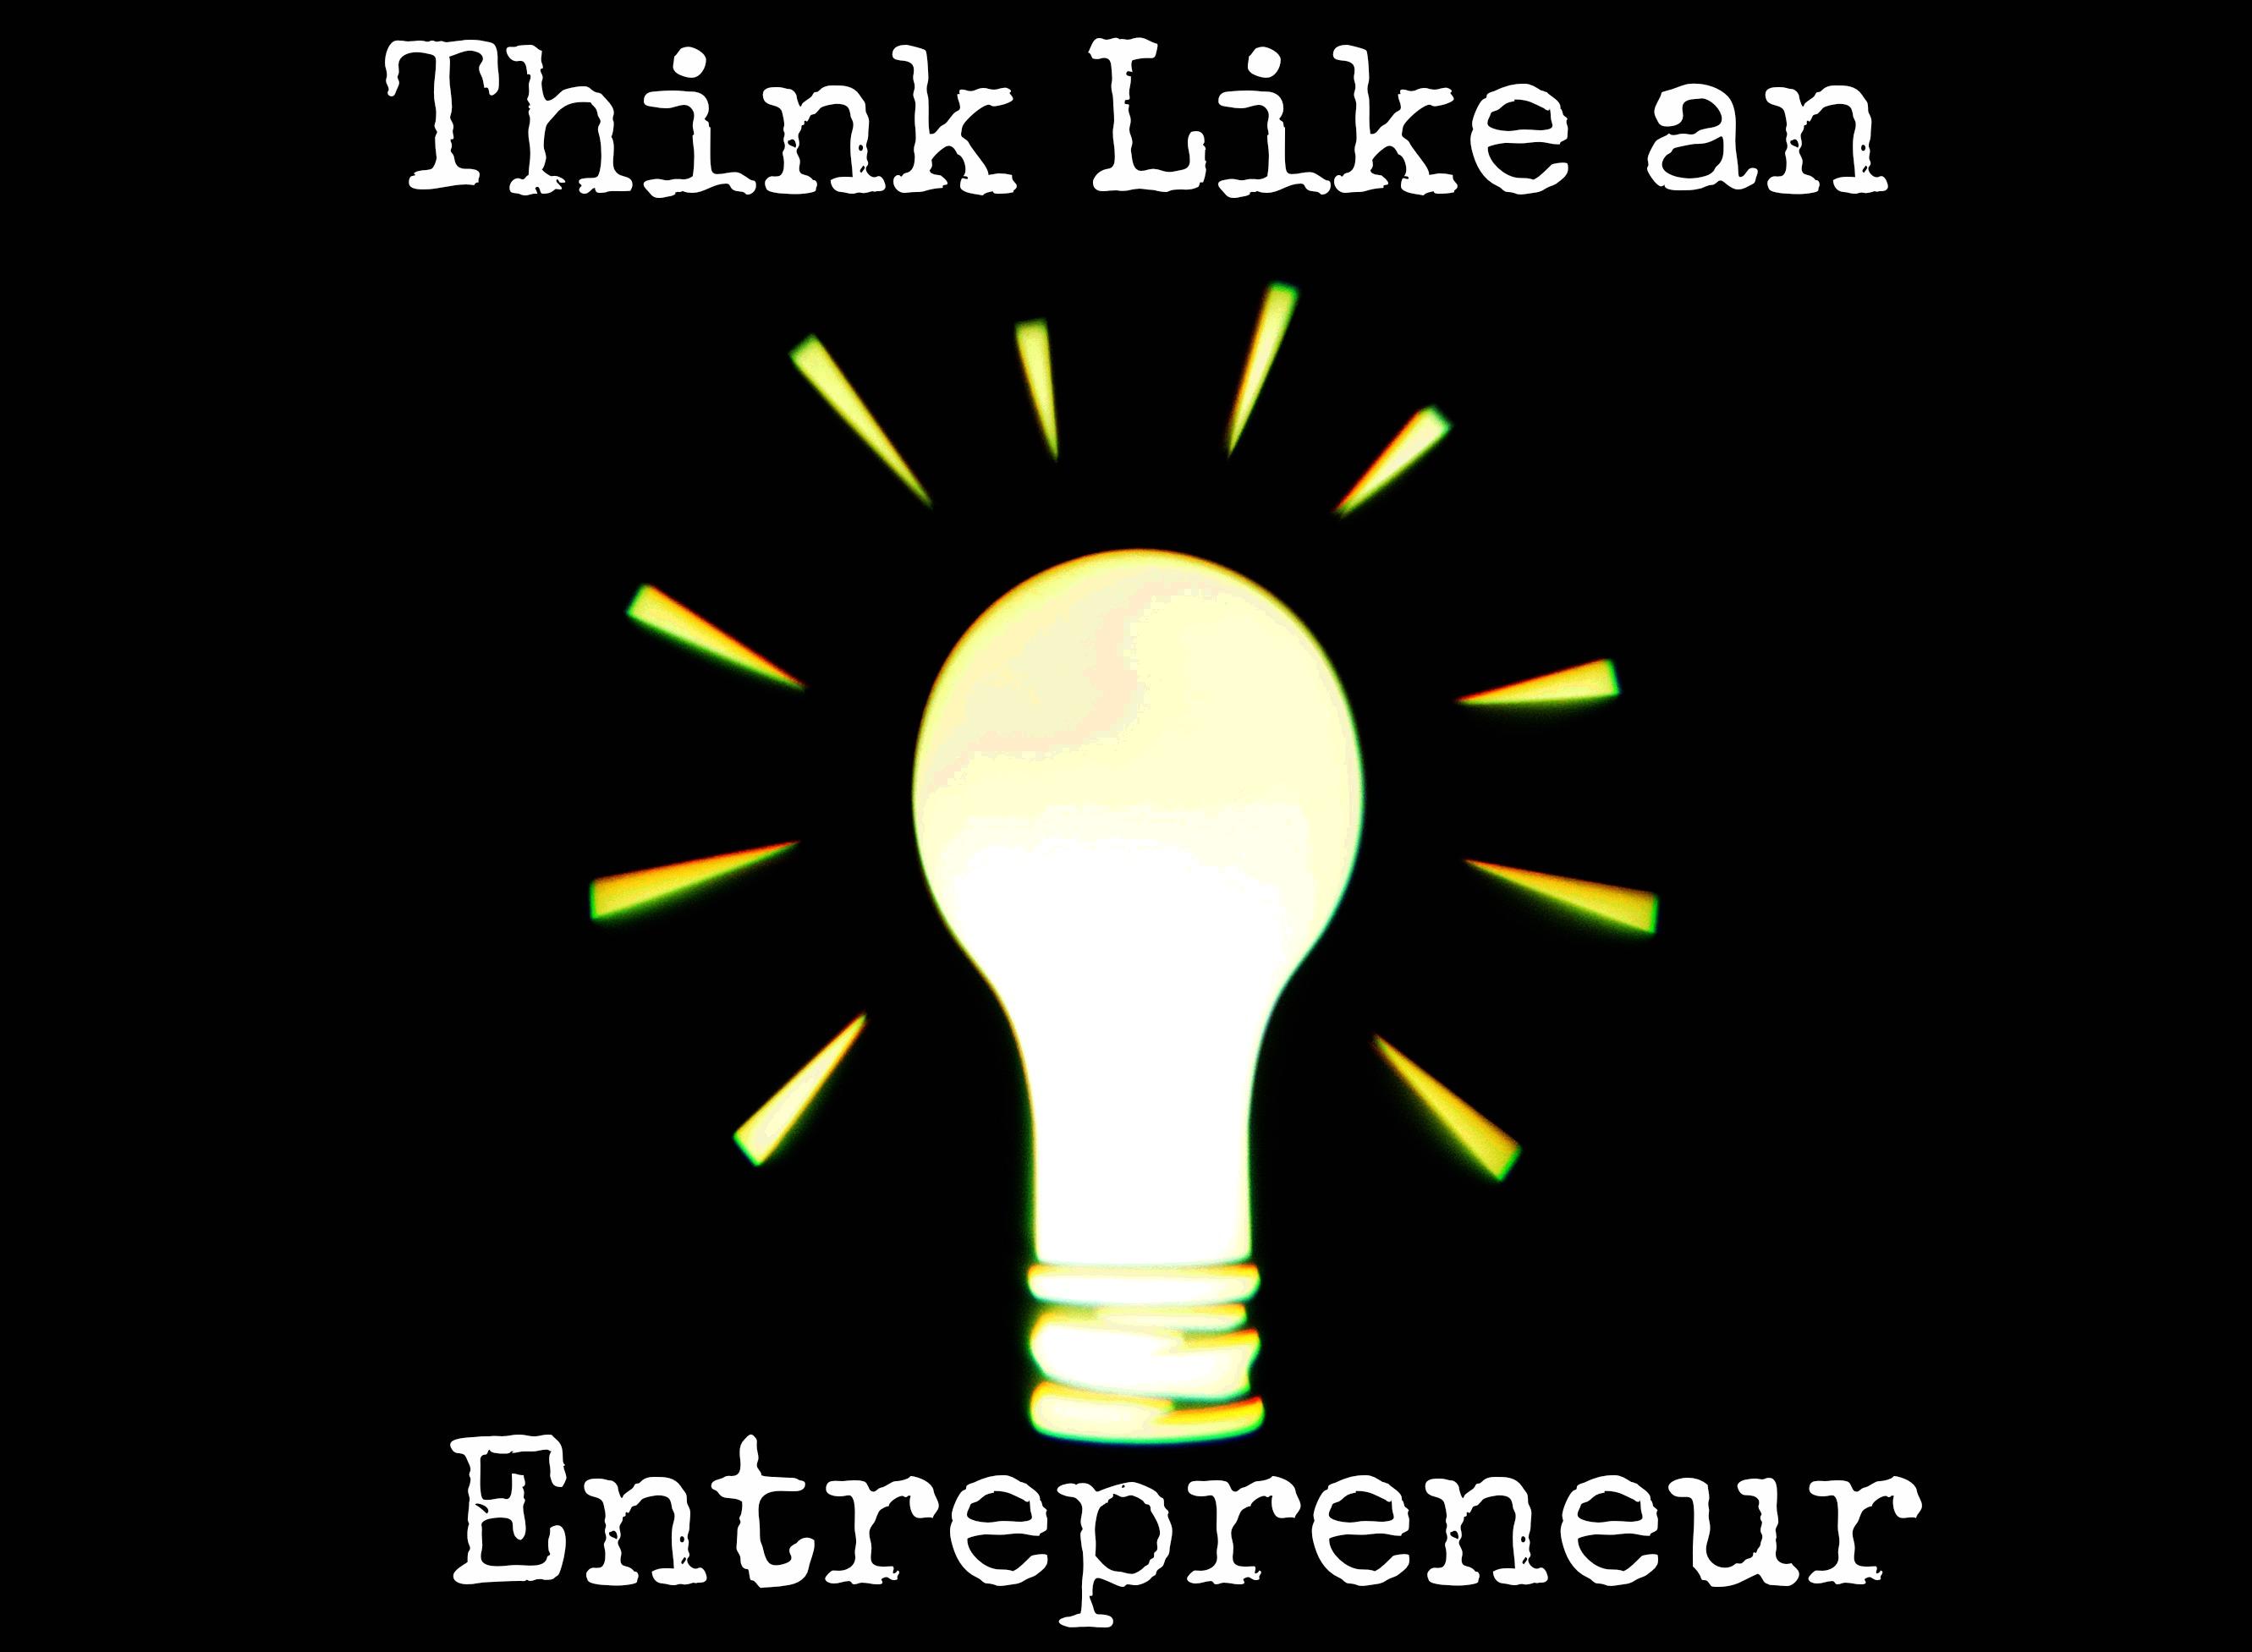 want to be an entrepreneur the princeton review s colleges want to be an entrepreneur the princeton review s 25 colleges the best entrepreneurship programs